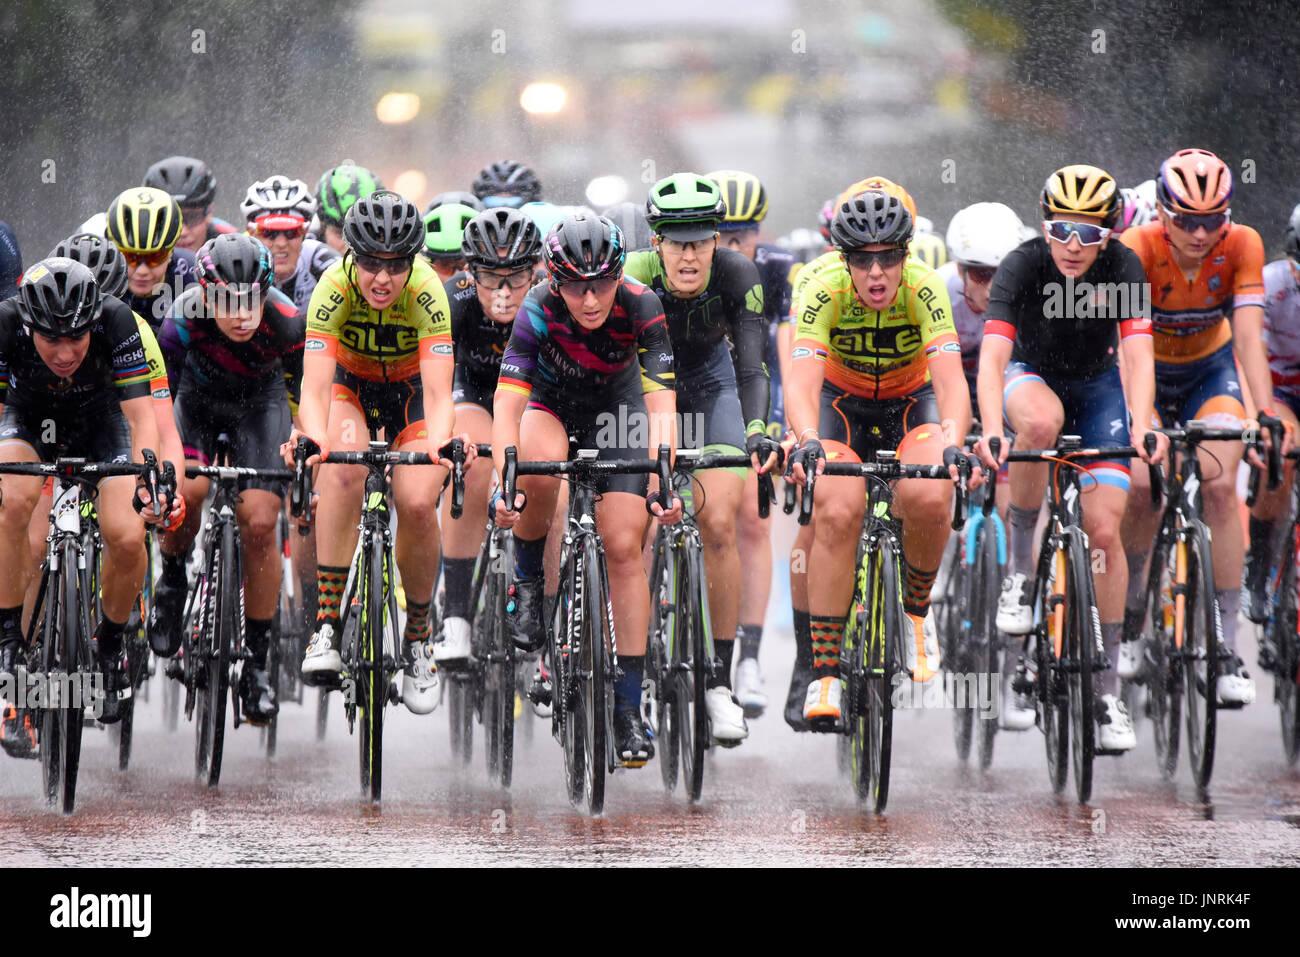 Classique Uci World Tour Femminile Professionista Cycle Race Parte